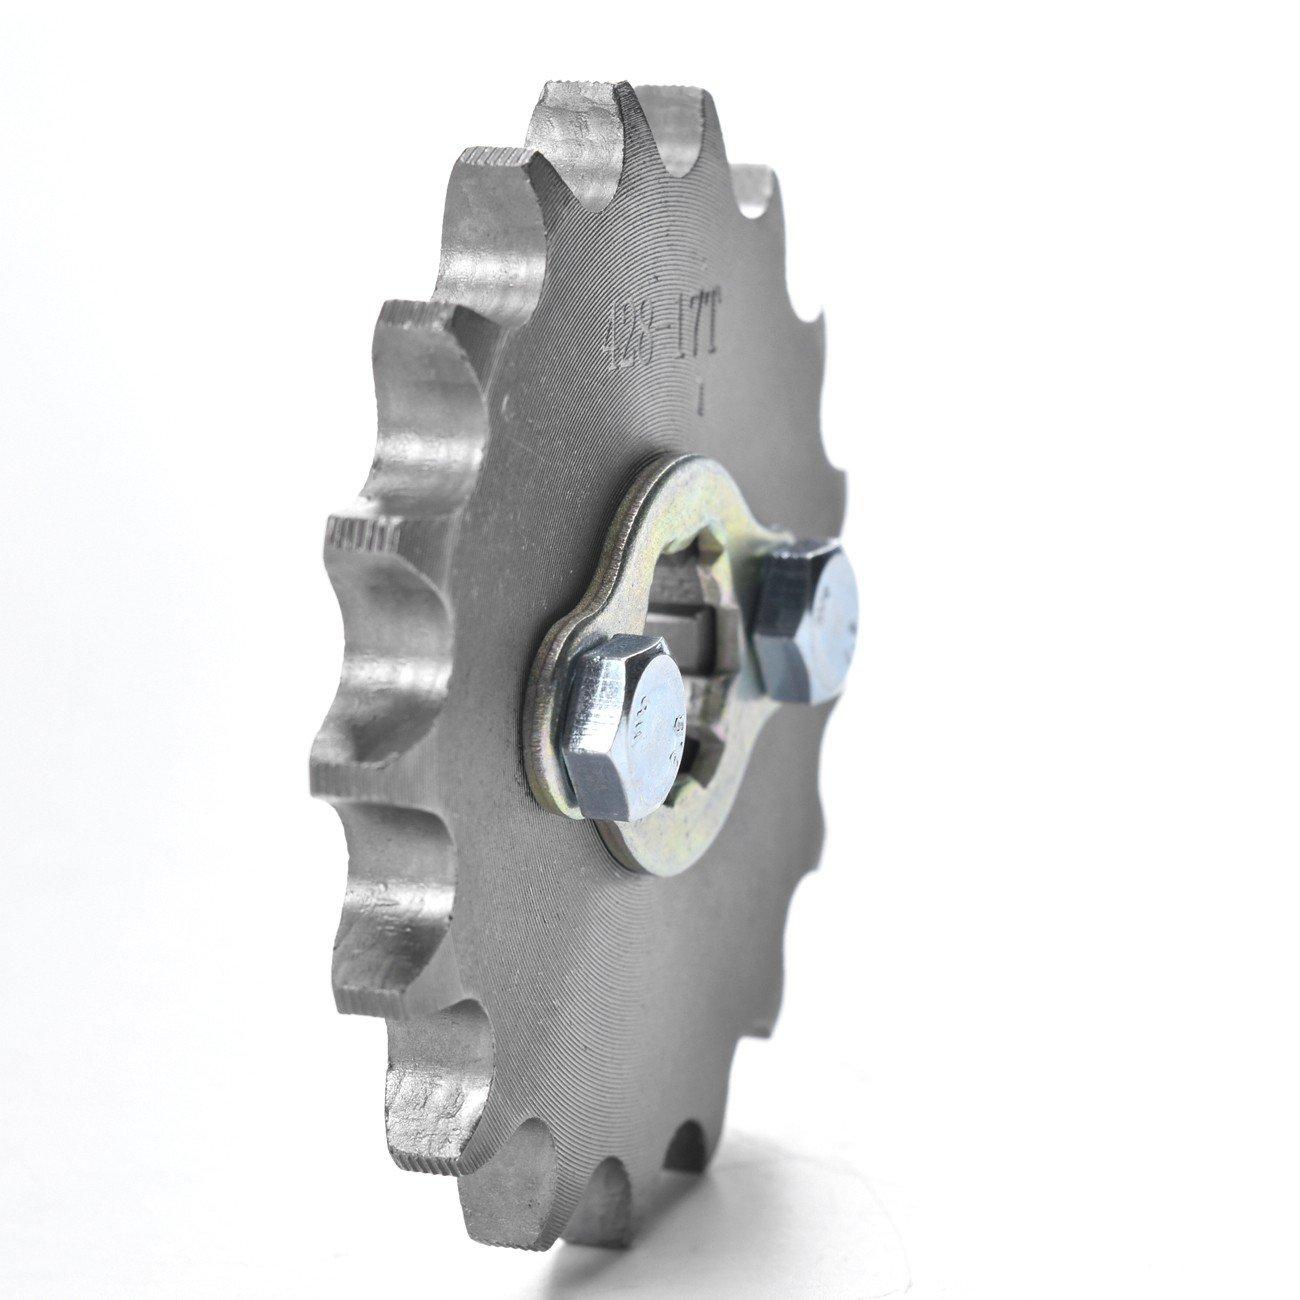 ZXTDR Engine Chain Sprocket 428-17T 17mm 17 Teeth for Dirt Pit Bike